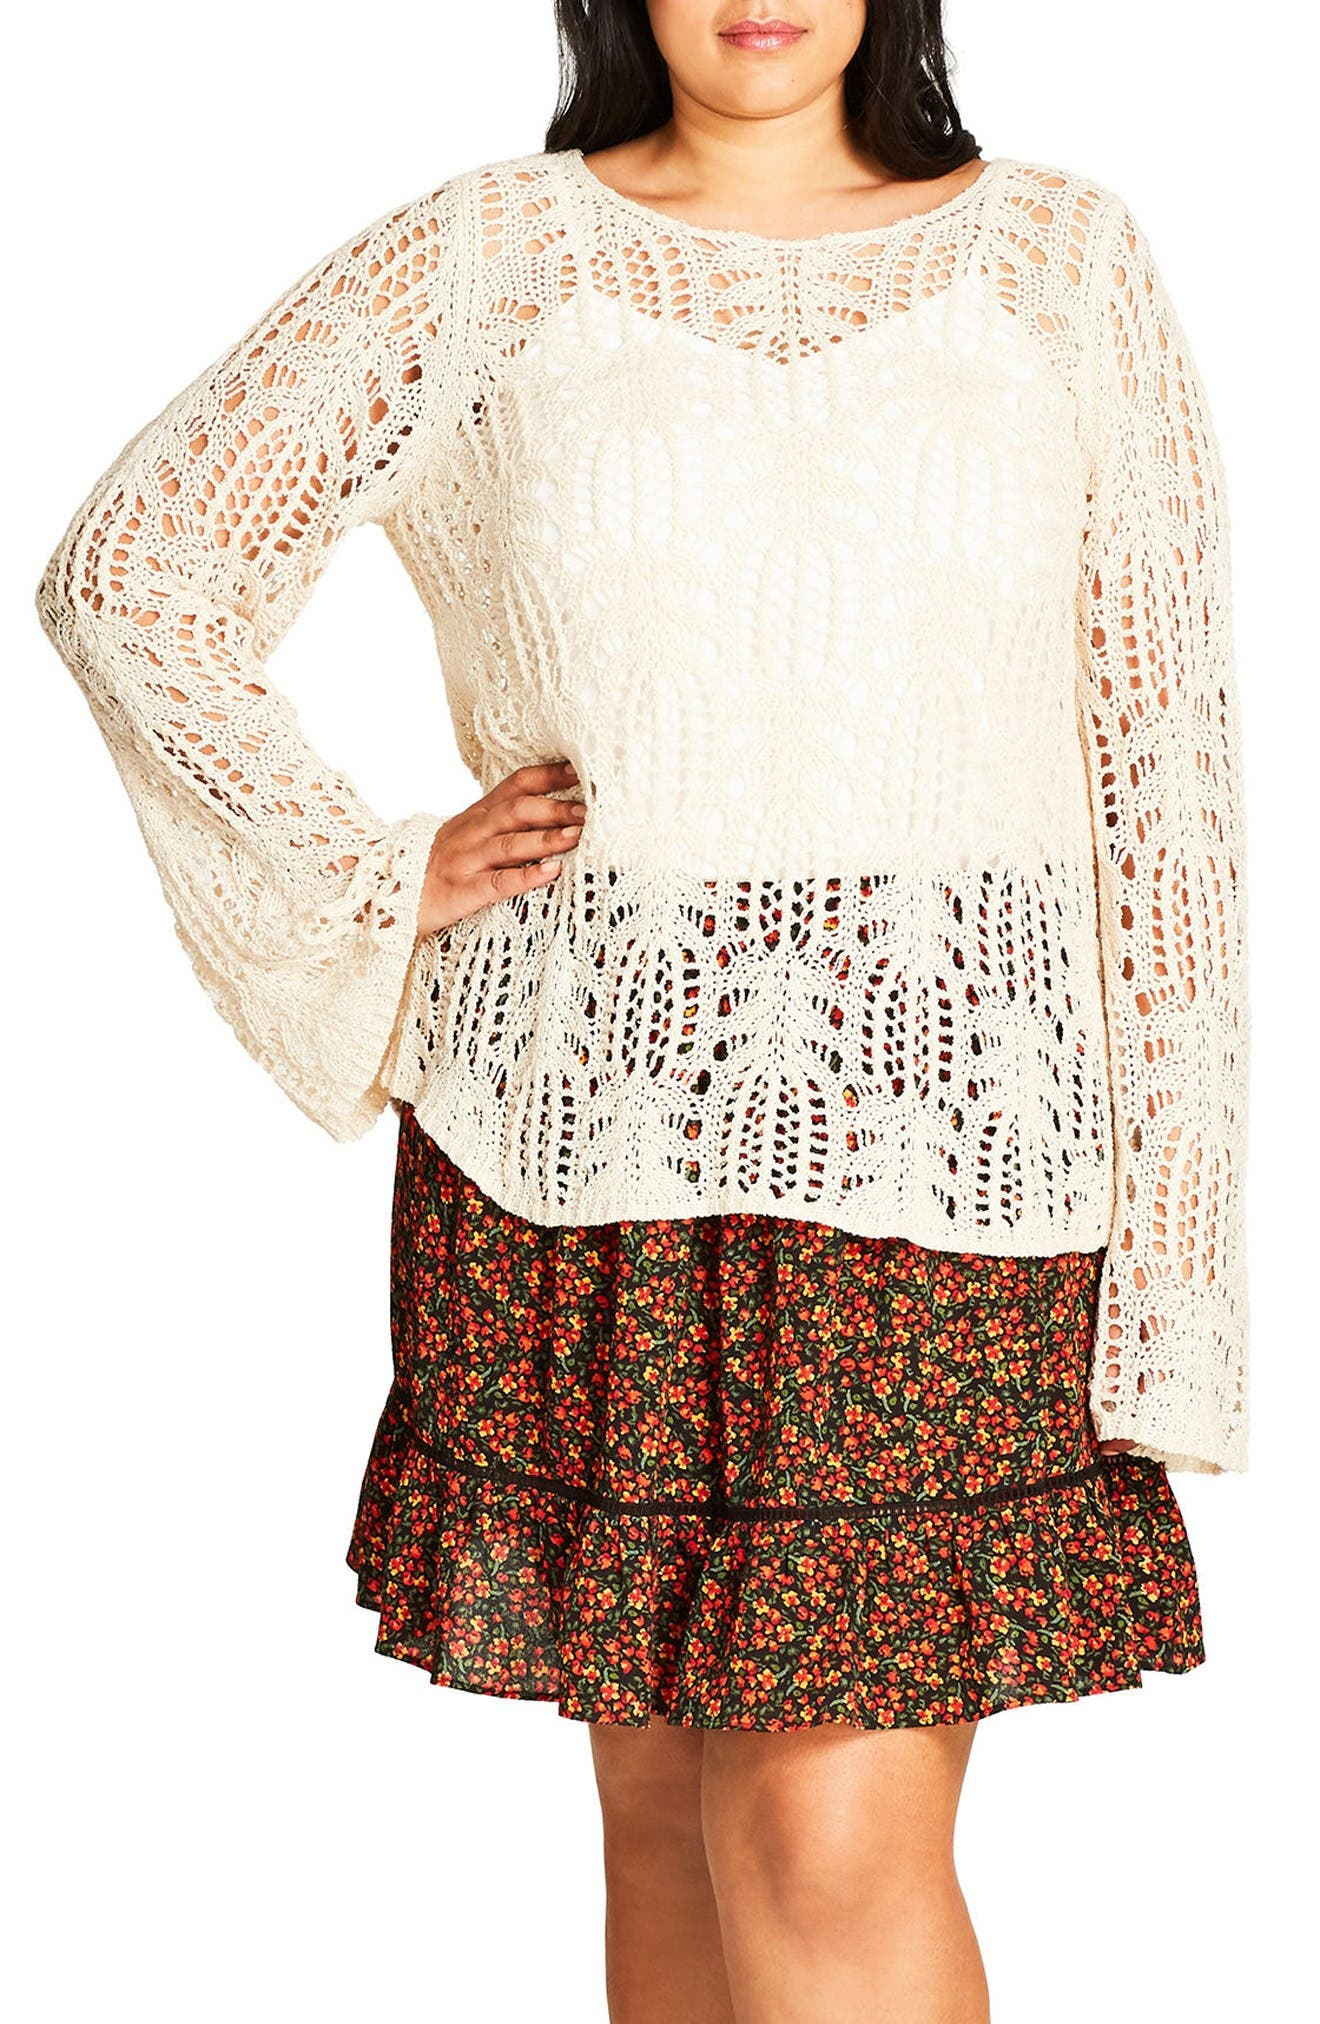 Main Image - City Chic So Delicate Crochet Sweater (Plus Size)